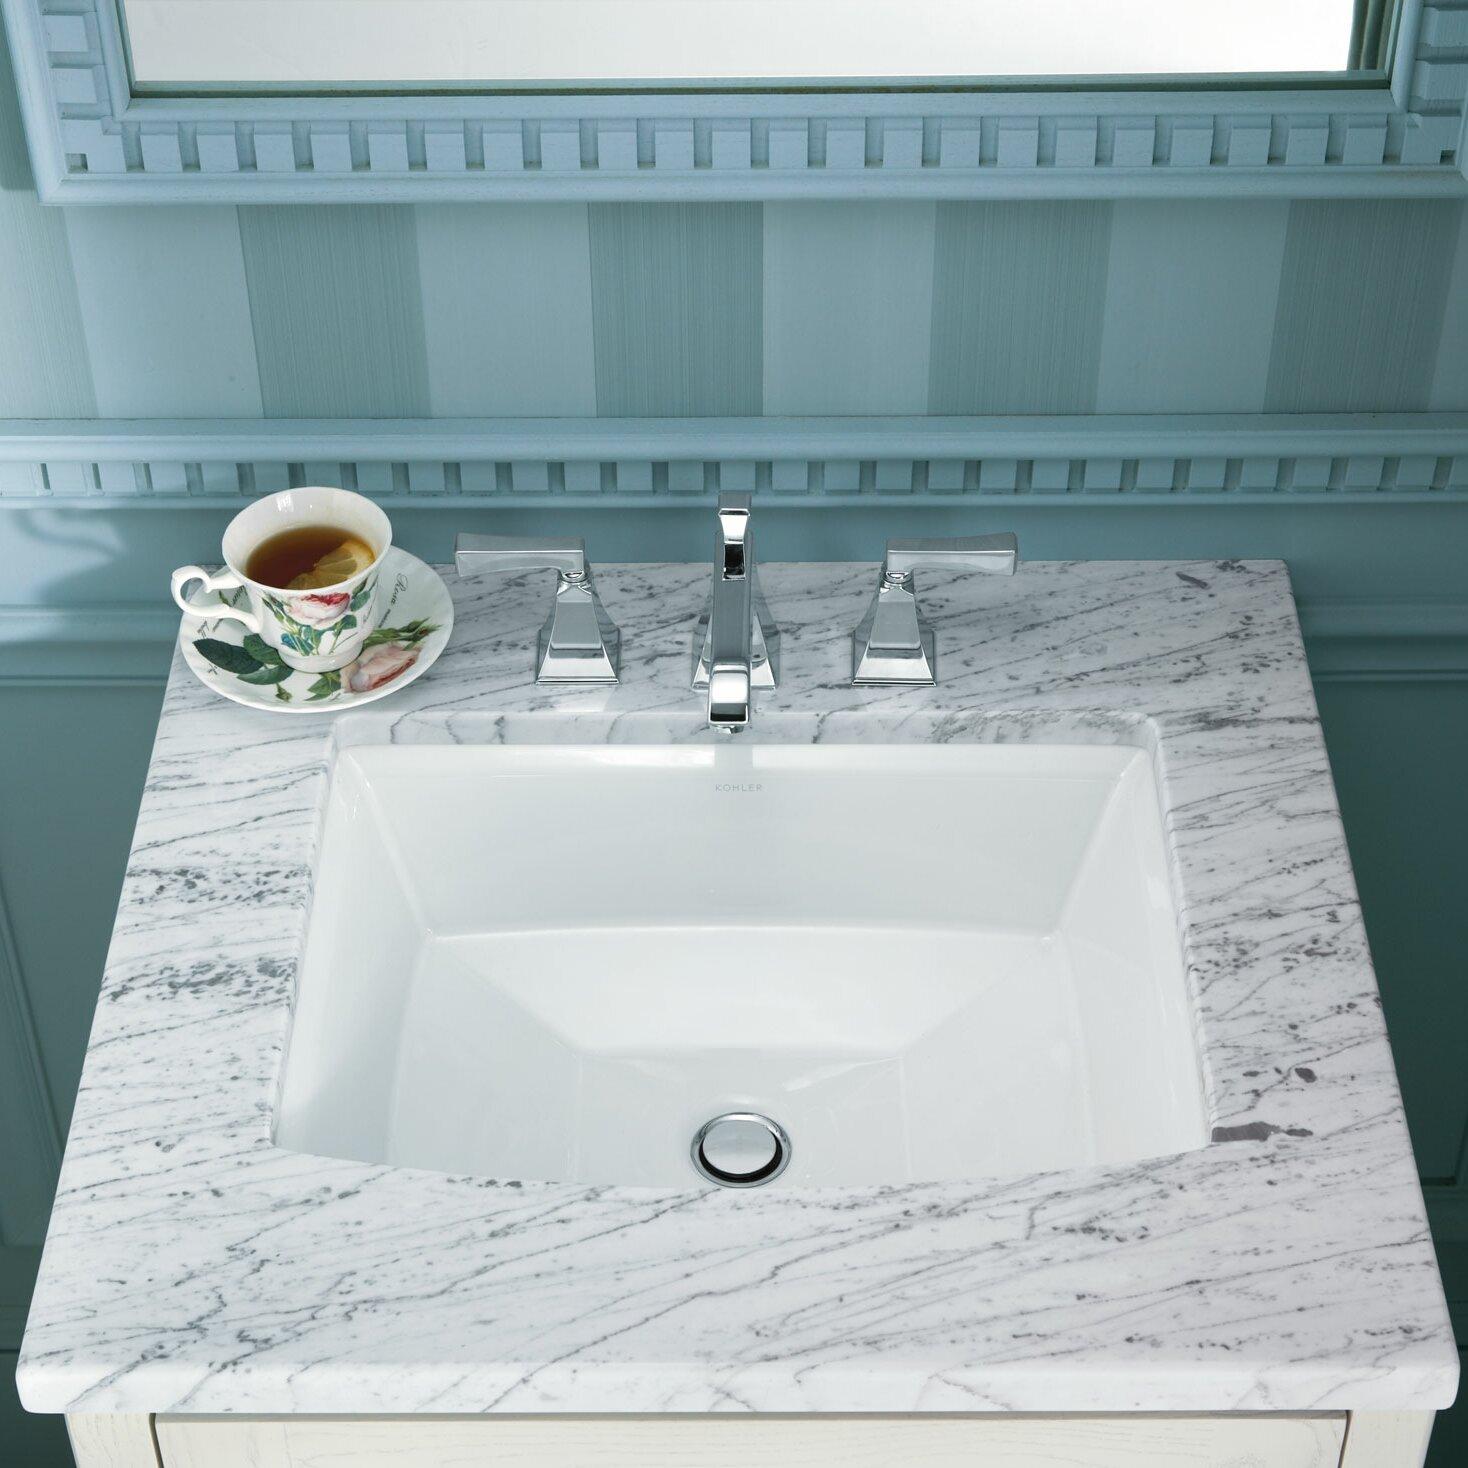 Kohler Archer Undermount Bathroom Sink & Reviews Wayfair